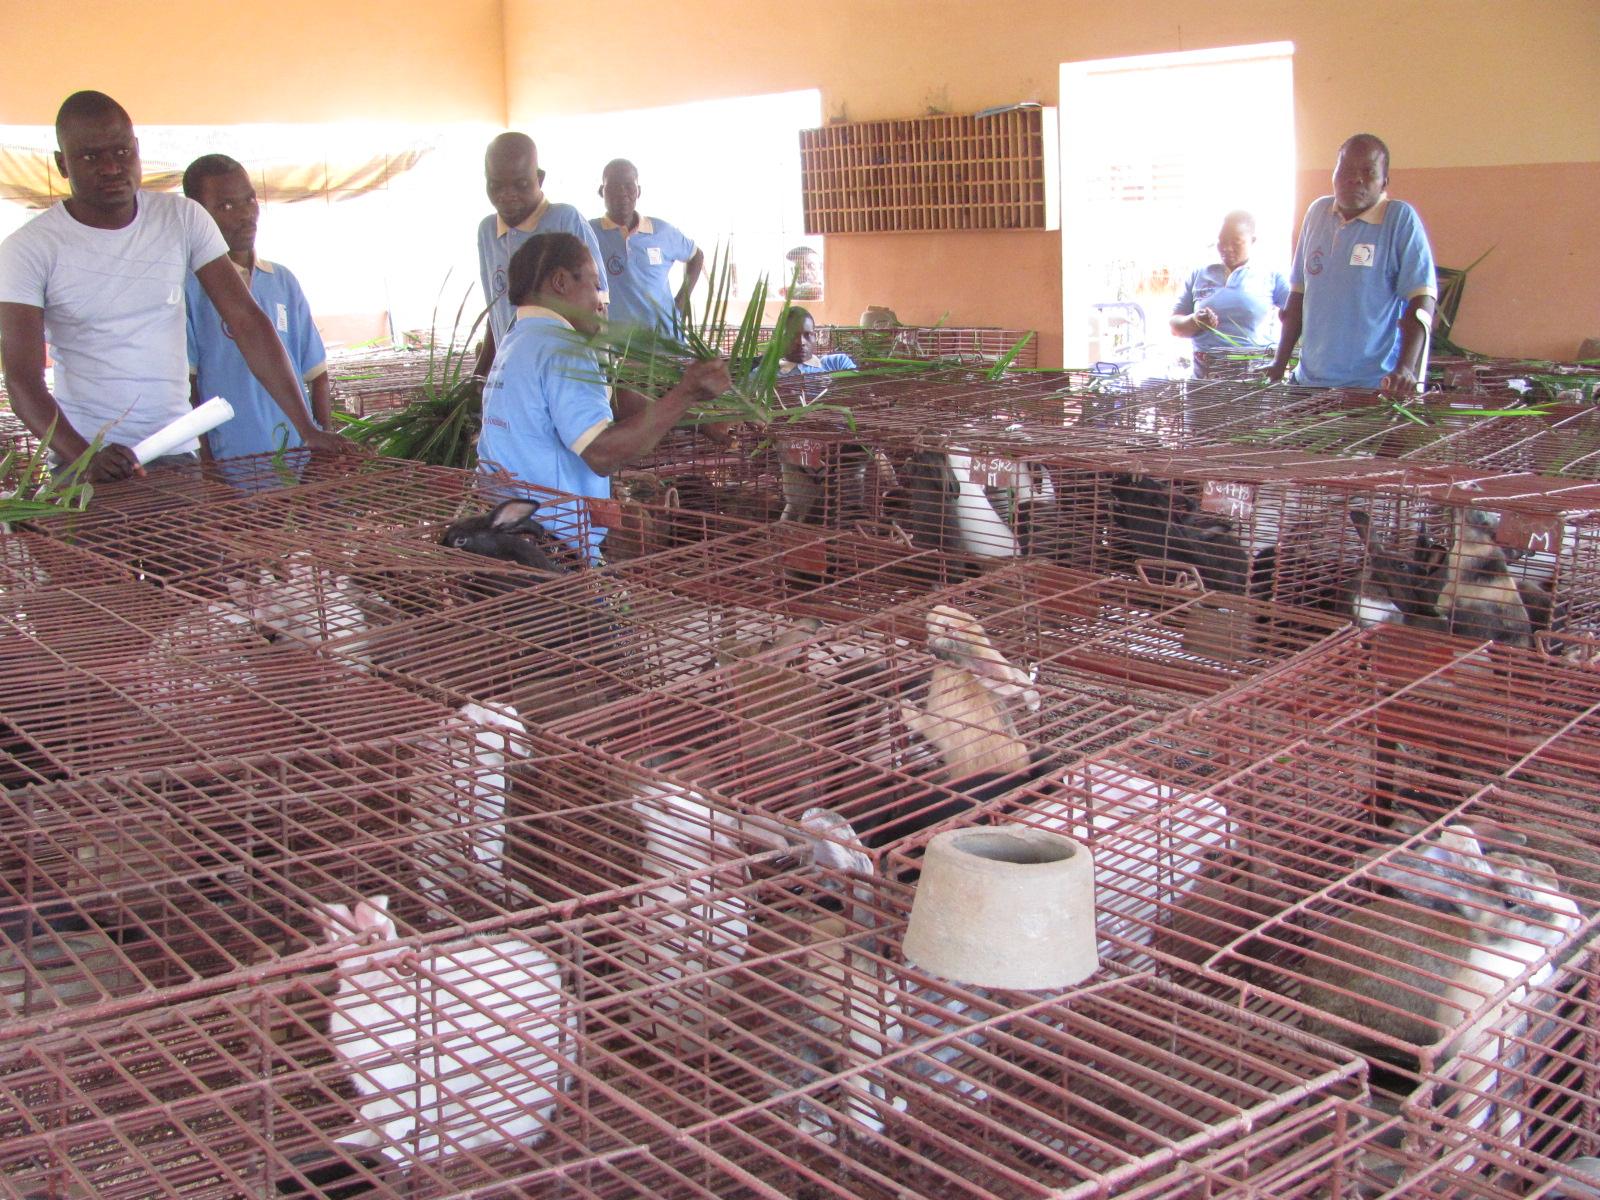 Benin rabbits cages.jpg